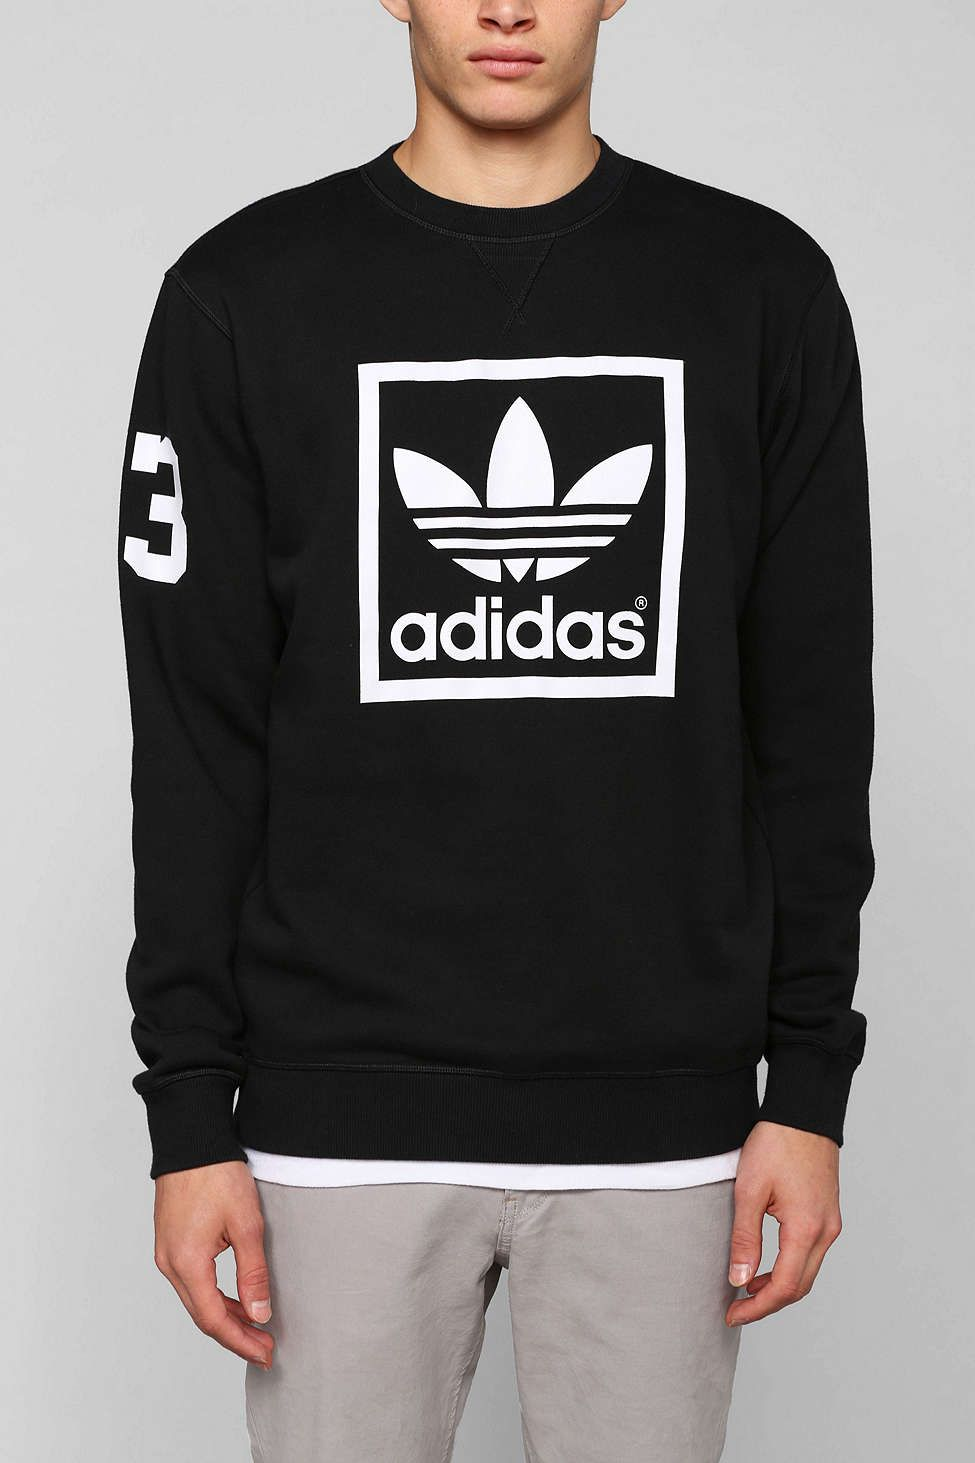 adidas Originals Trefoil Crew neck Sweatshirt | Addidas